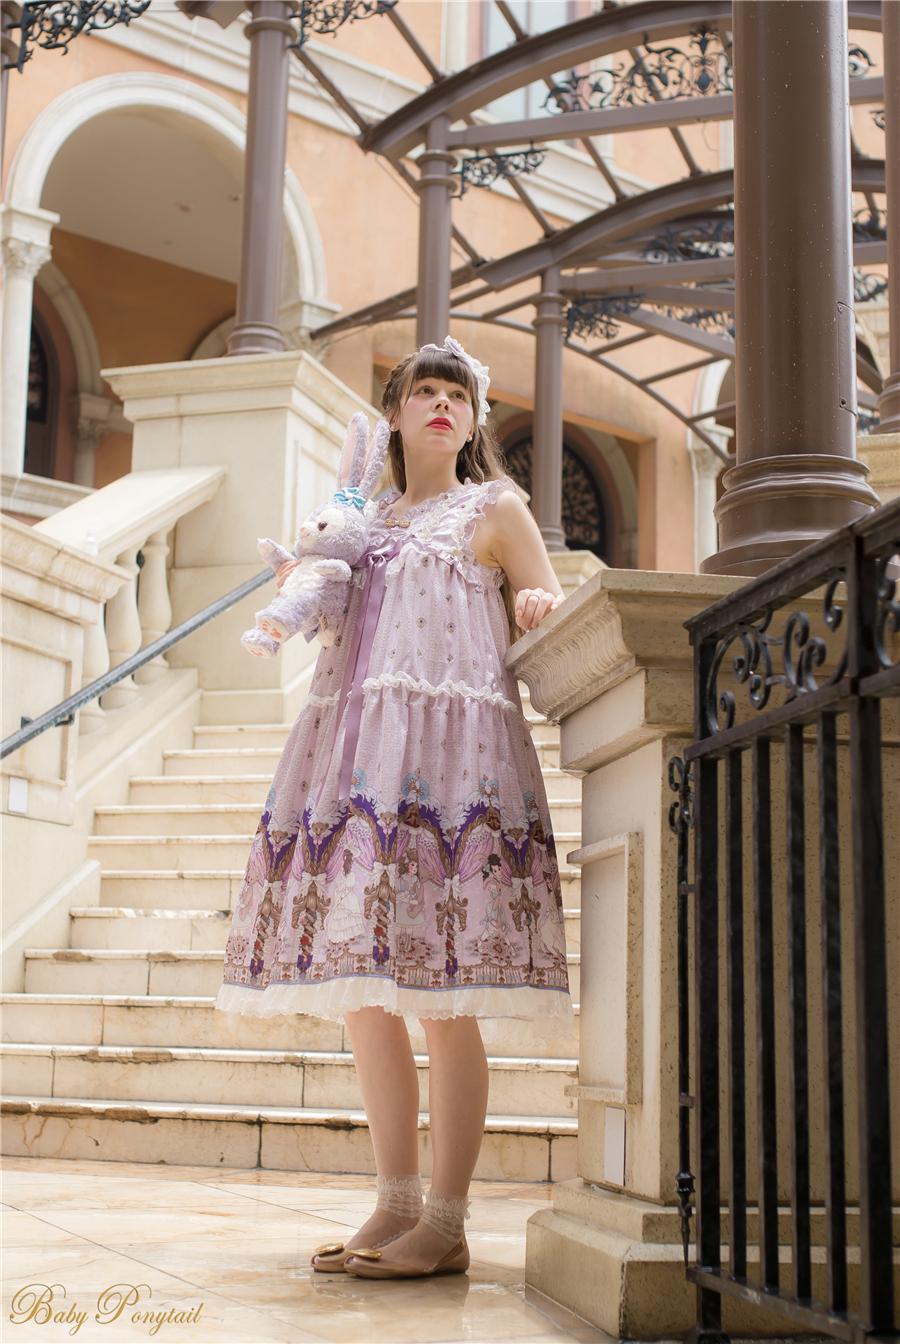 BabyPonytail_Model Preview_My Favorite Companion_Purple JSK_NG-3_Claudia_07.jpg